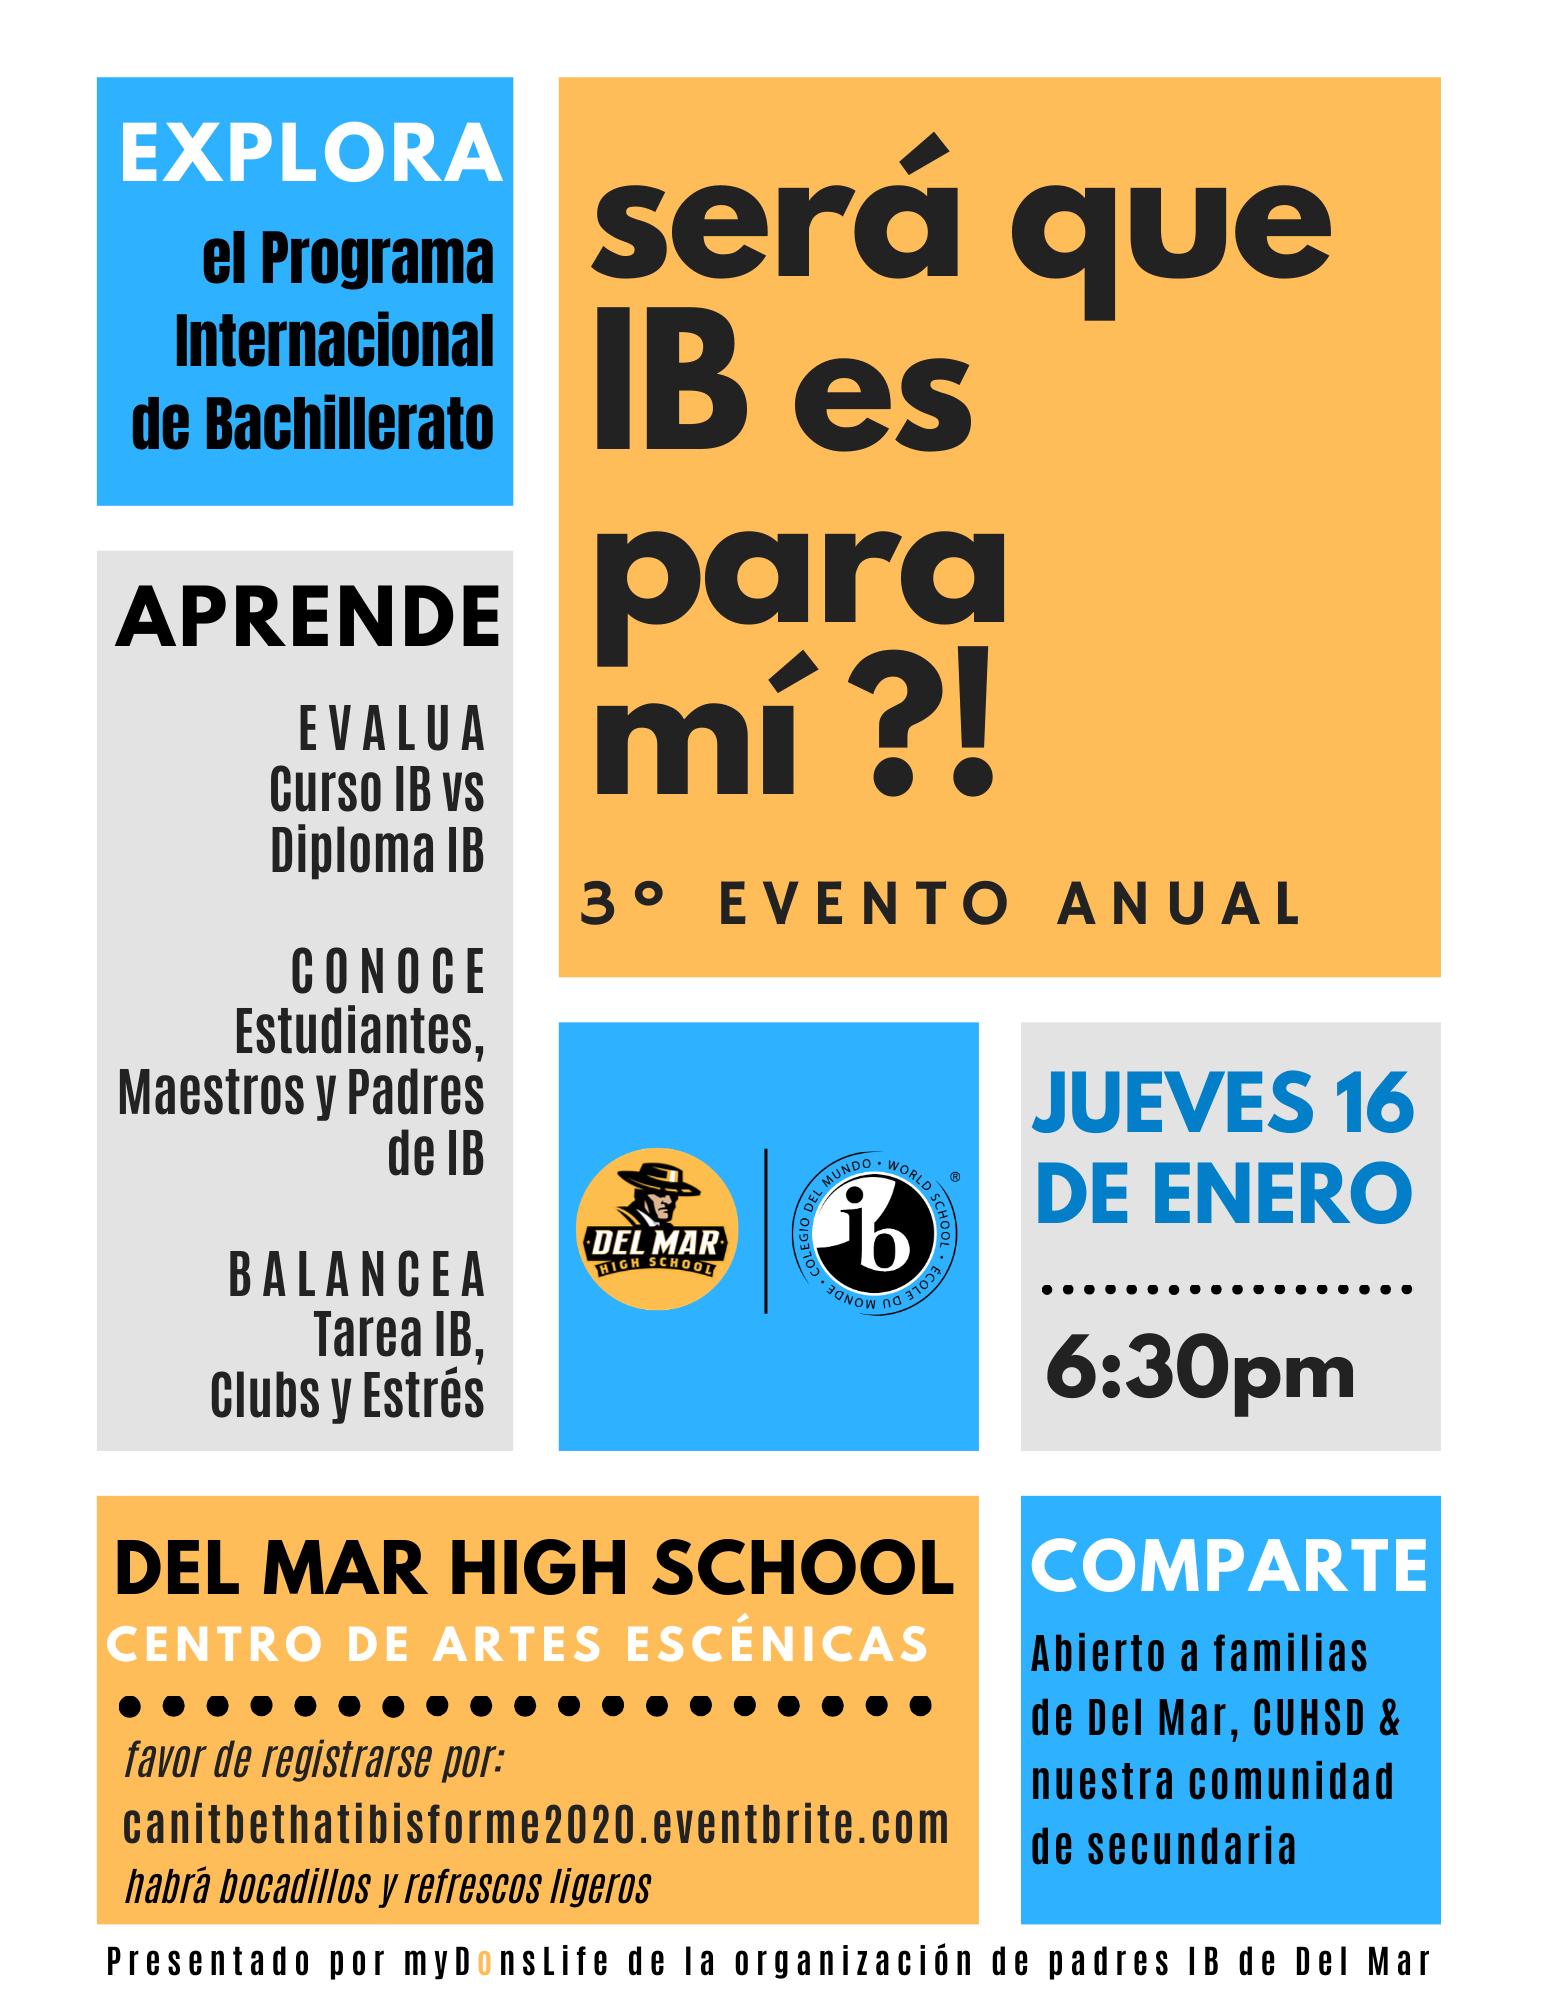 image of january 16, 2020 del mar ib talk flyer in spanish